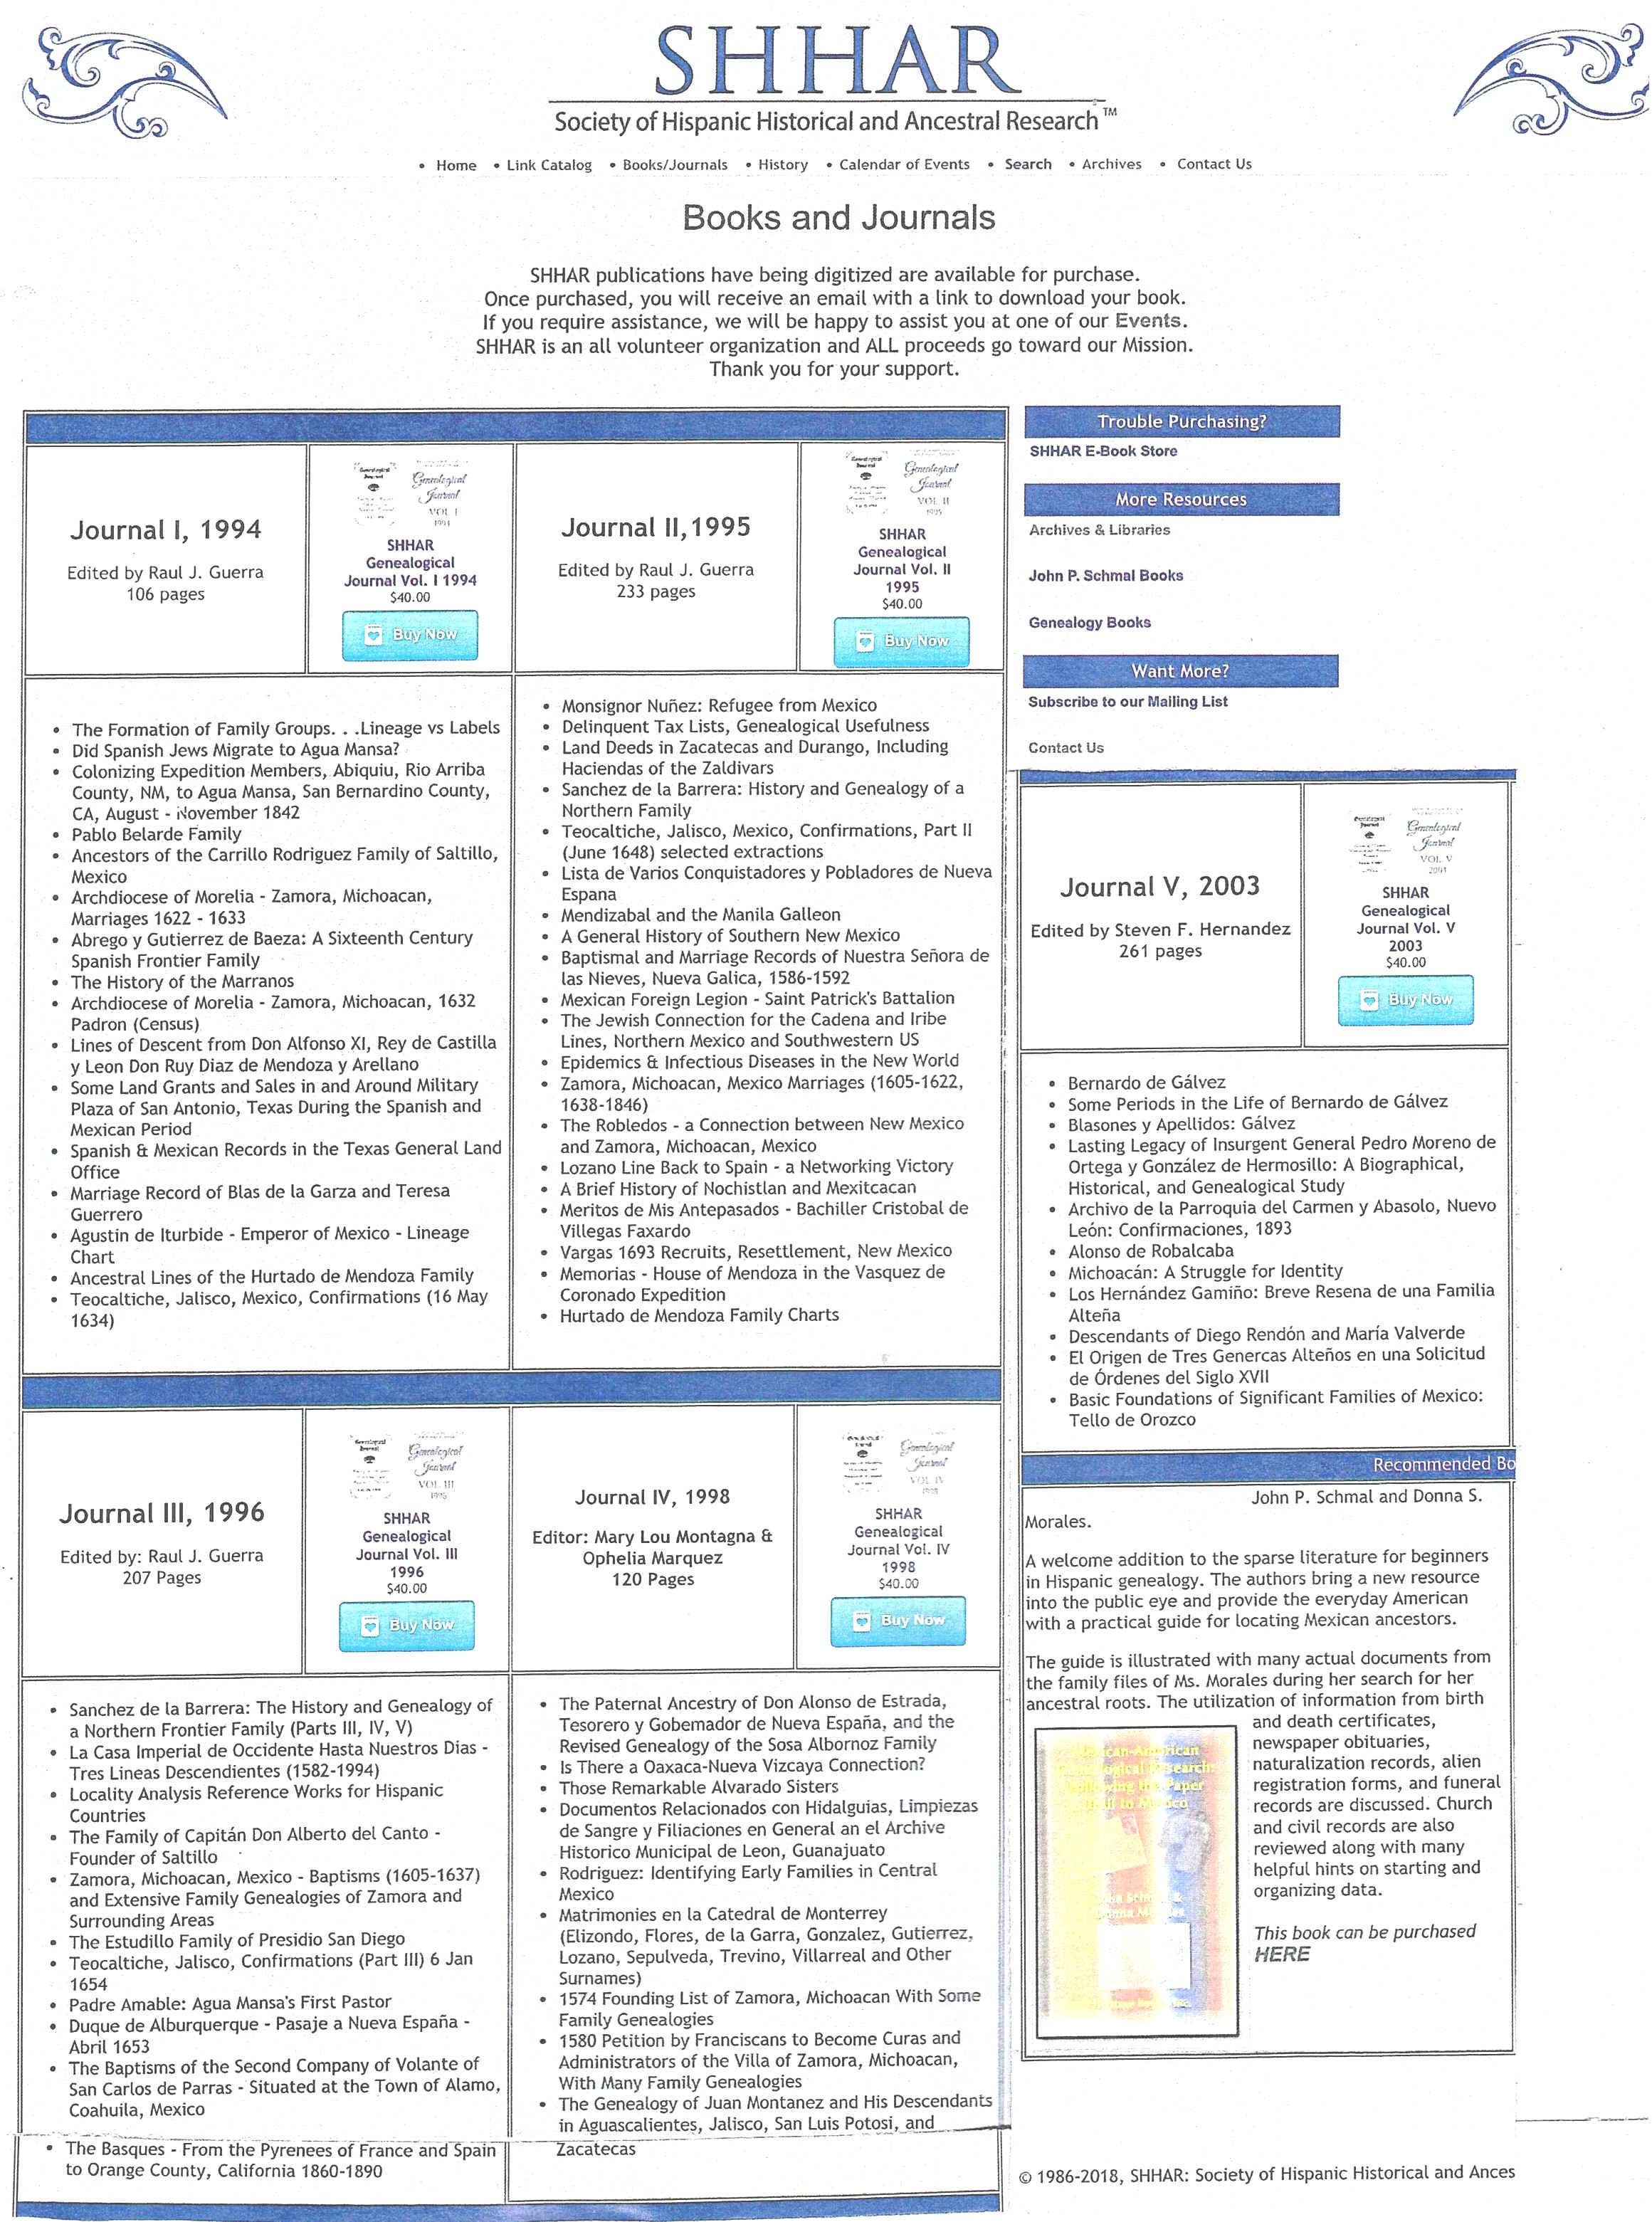 Muebles Daca Castelar - Somos Primos[mjhdah]http://www.somosprimos.com/sp2018/spmar18/Somos_Primos_CD_Order_Form.jpg